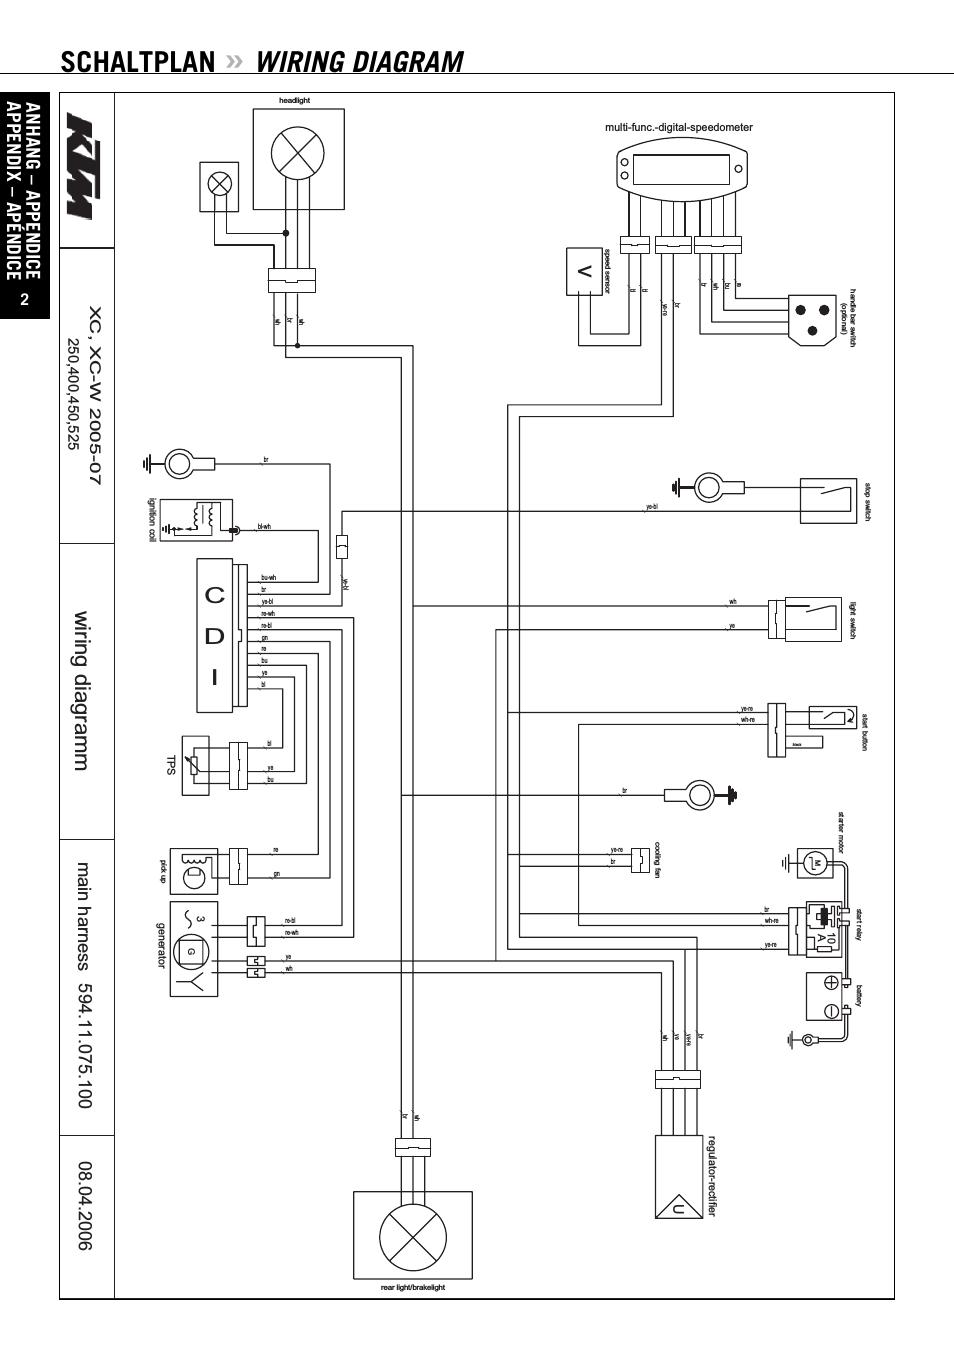 DV_8797] Ktm 250 Xc Wiring Diagram Free DiagramTixat Inkl Lopla Antus Exmet Omit Garna Mohammedshrine Librar Wiring 101